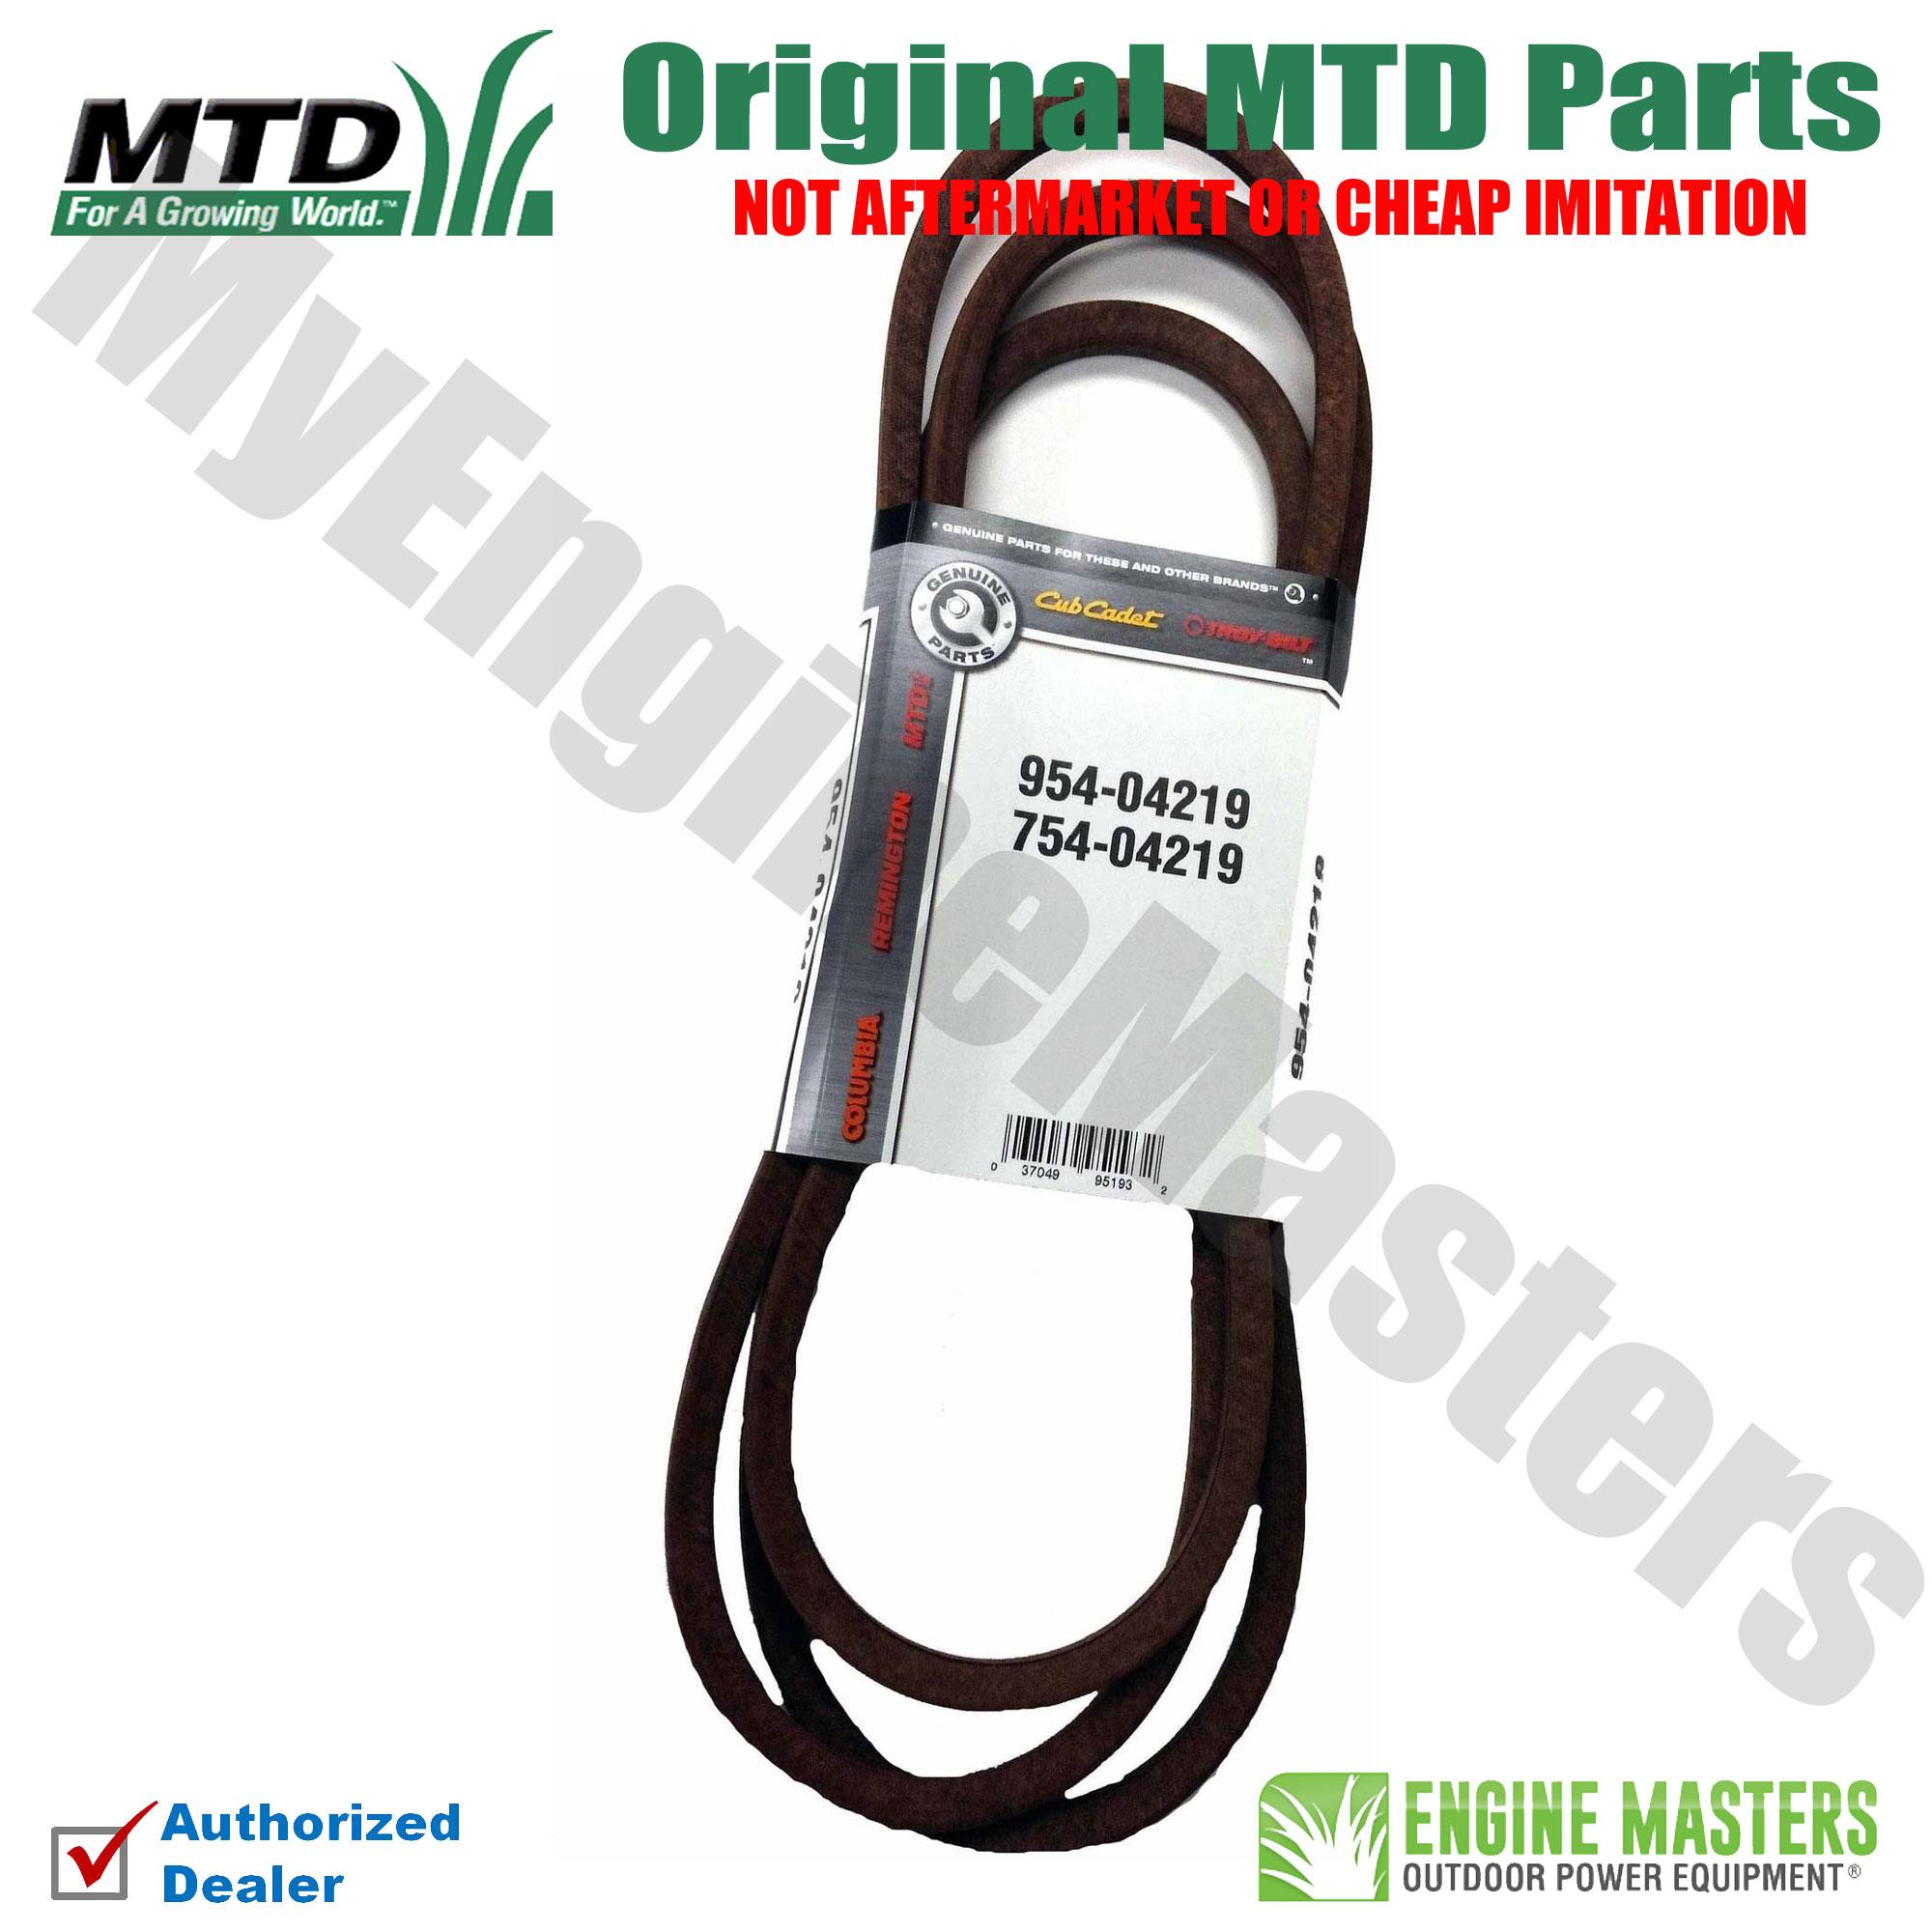 Details about Mtd Craftsman 954-04219 Lawn Tractor Blade Drive Belt Genuine  Original Equipment